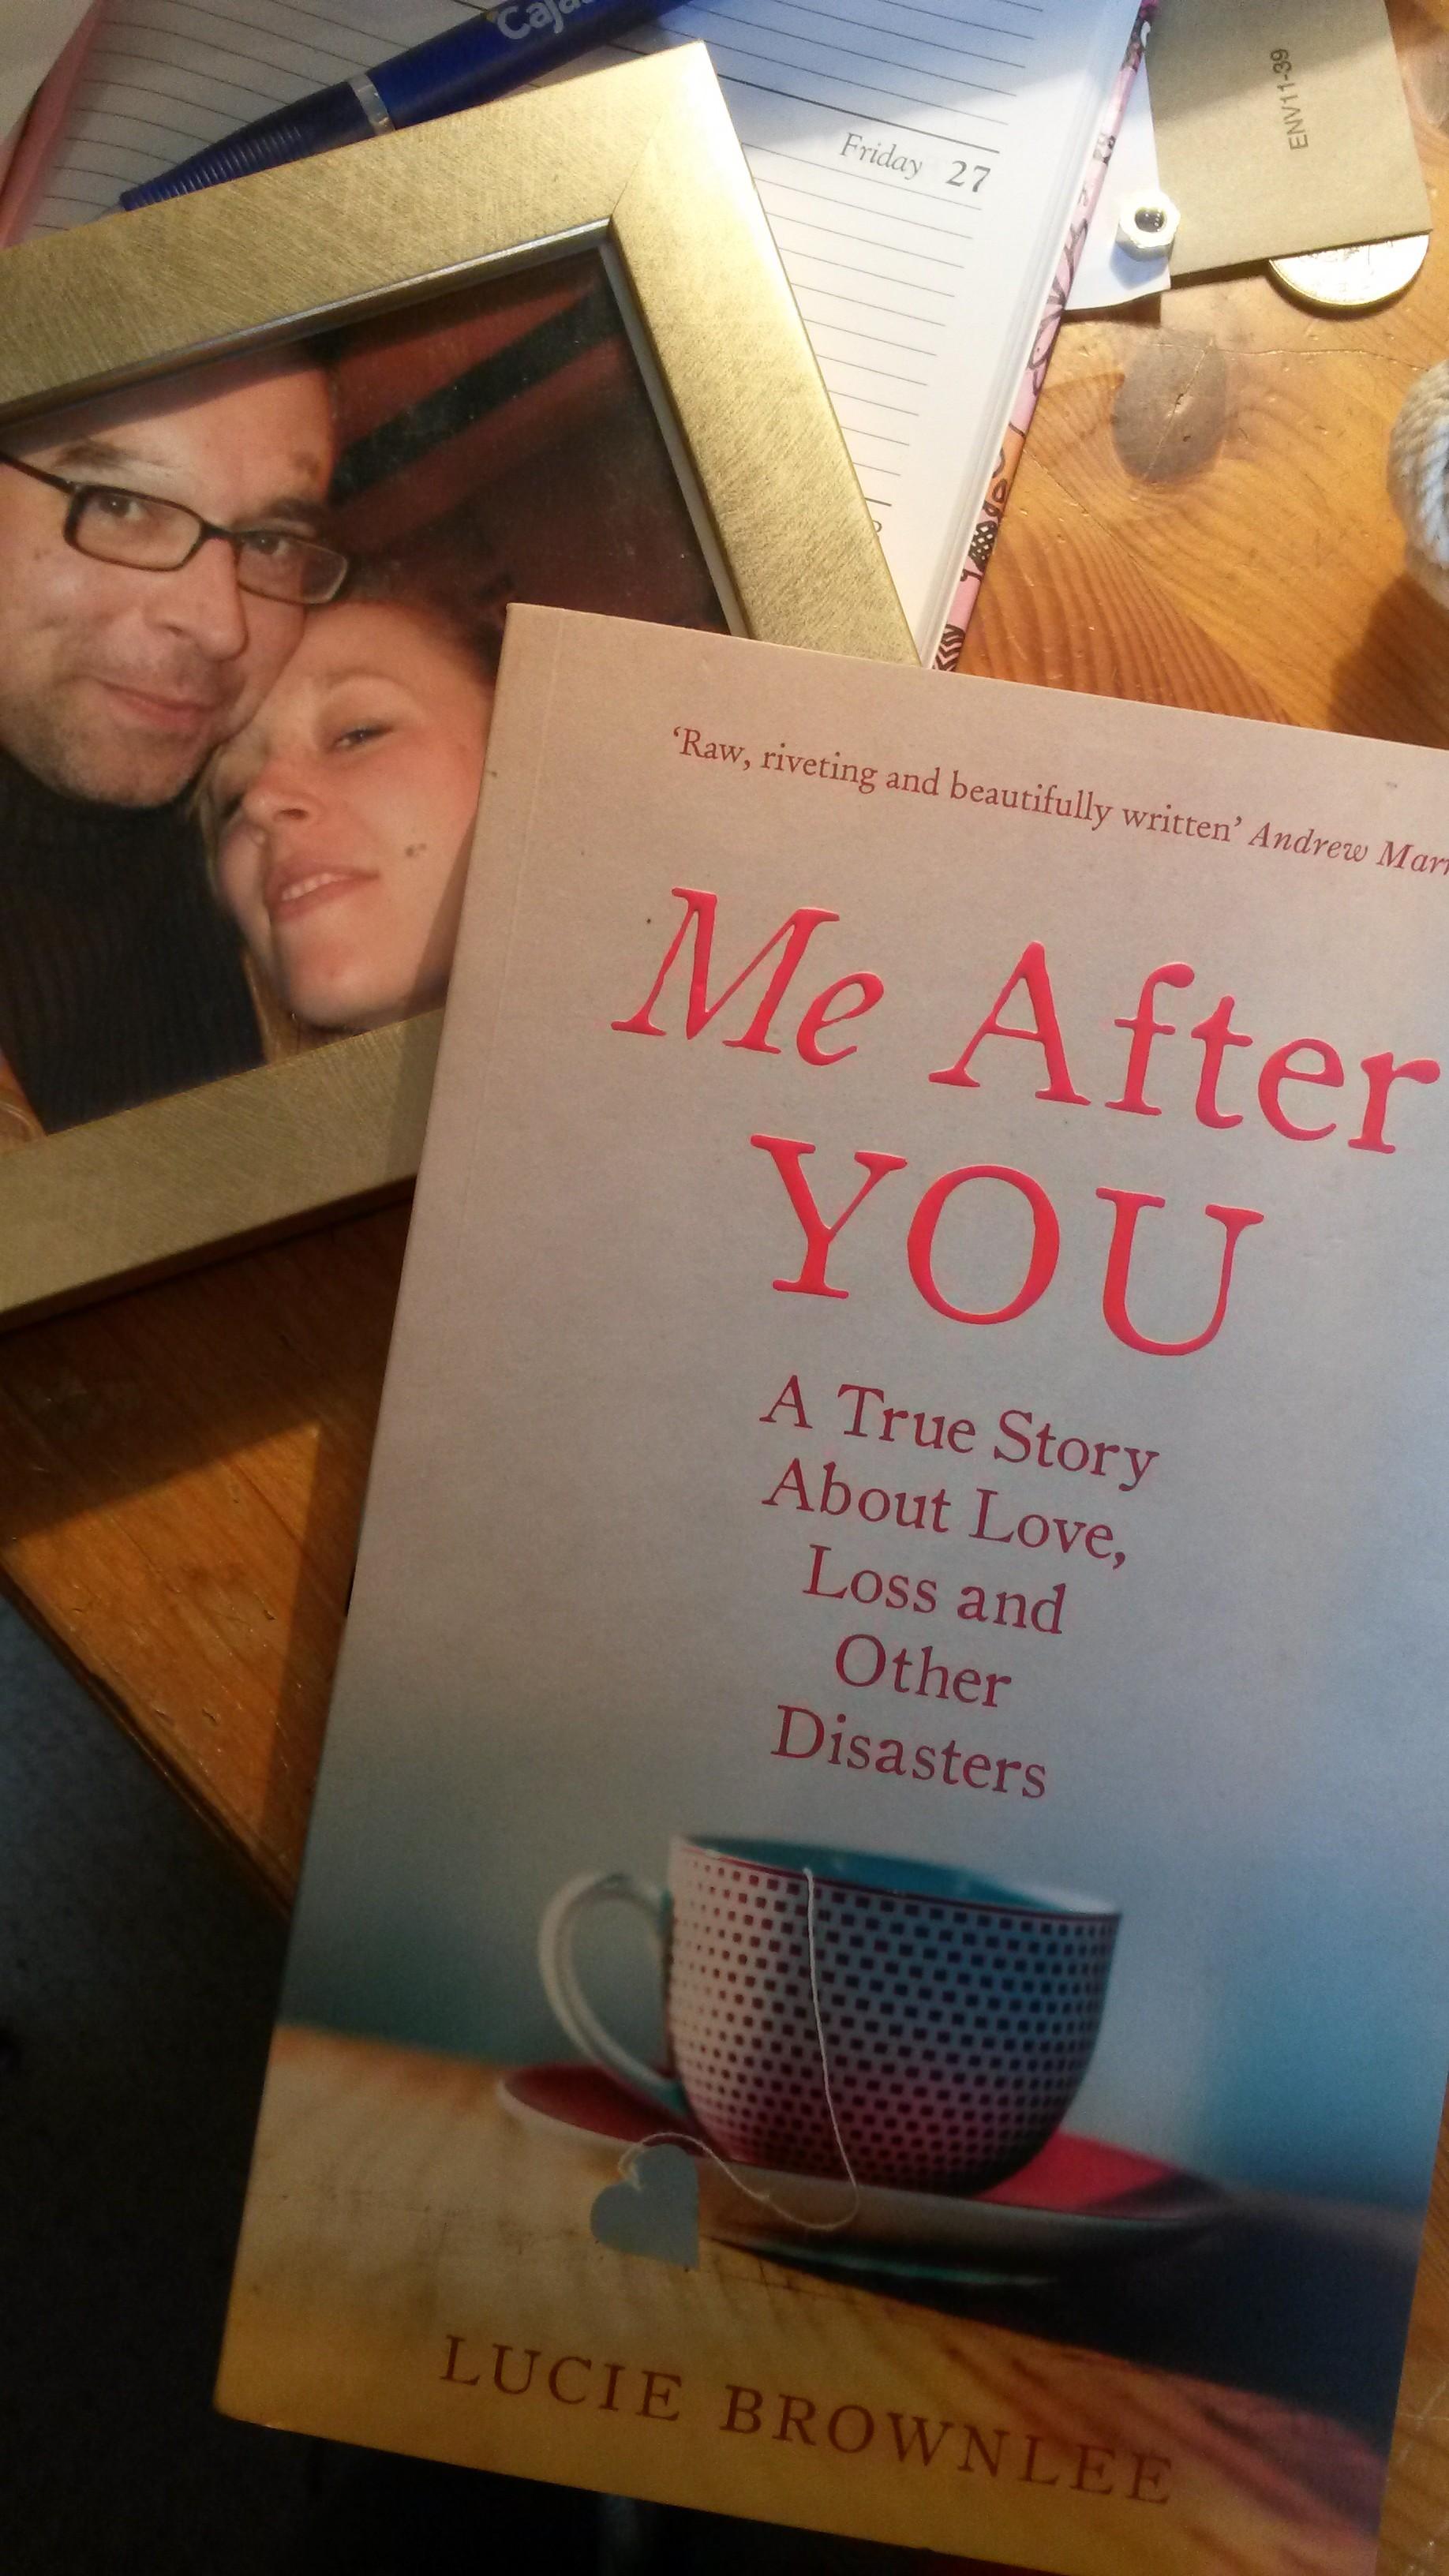 Life after death spouse